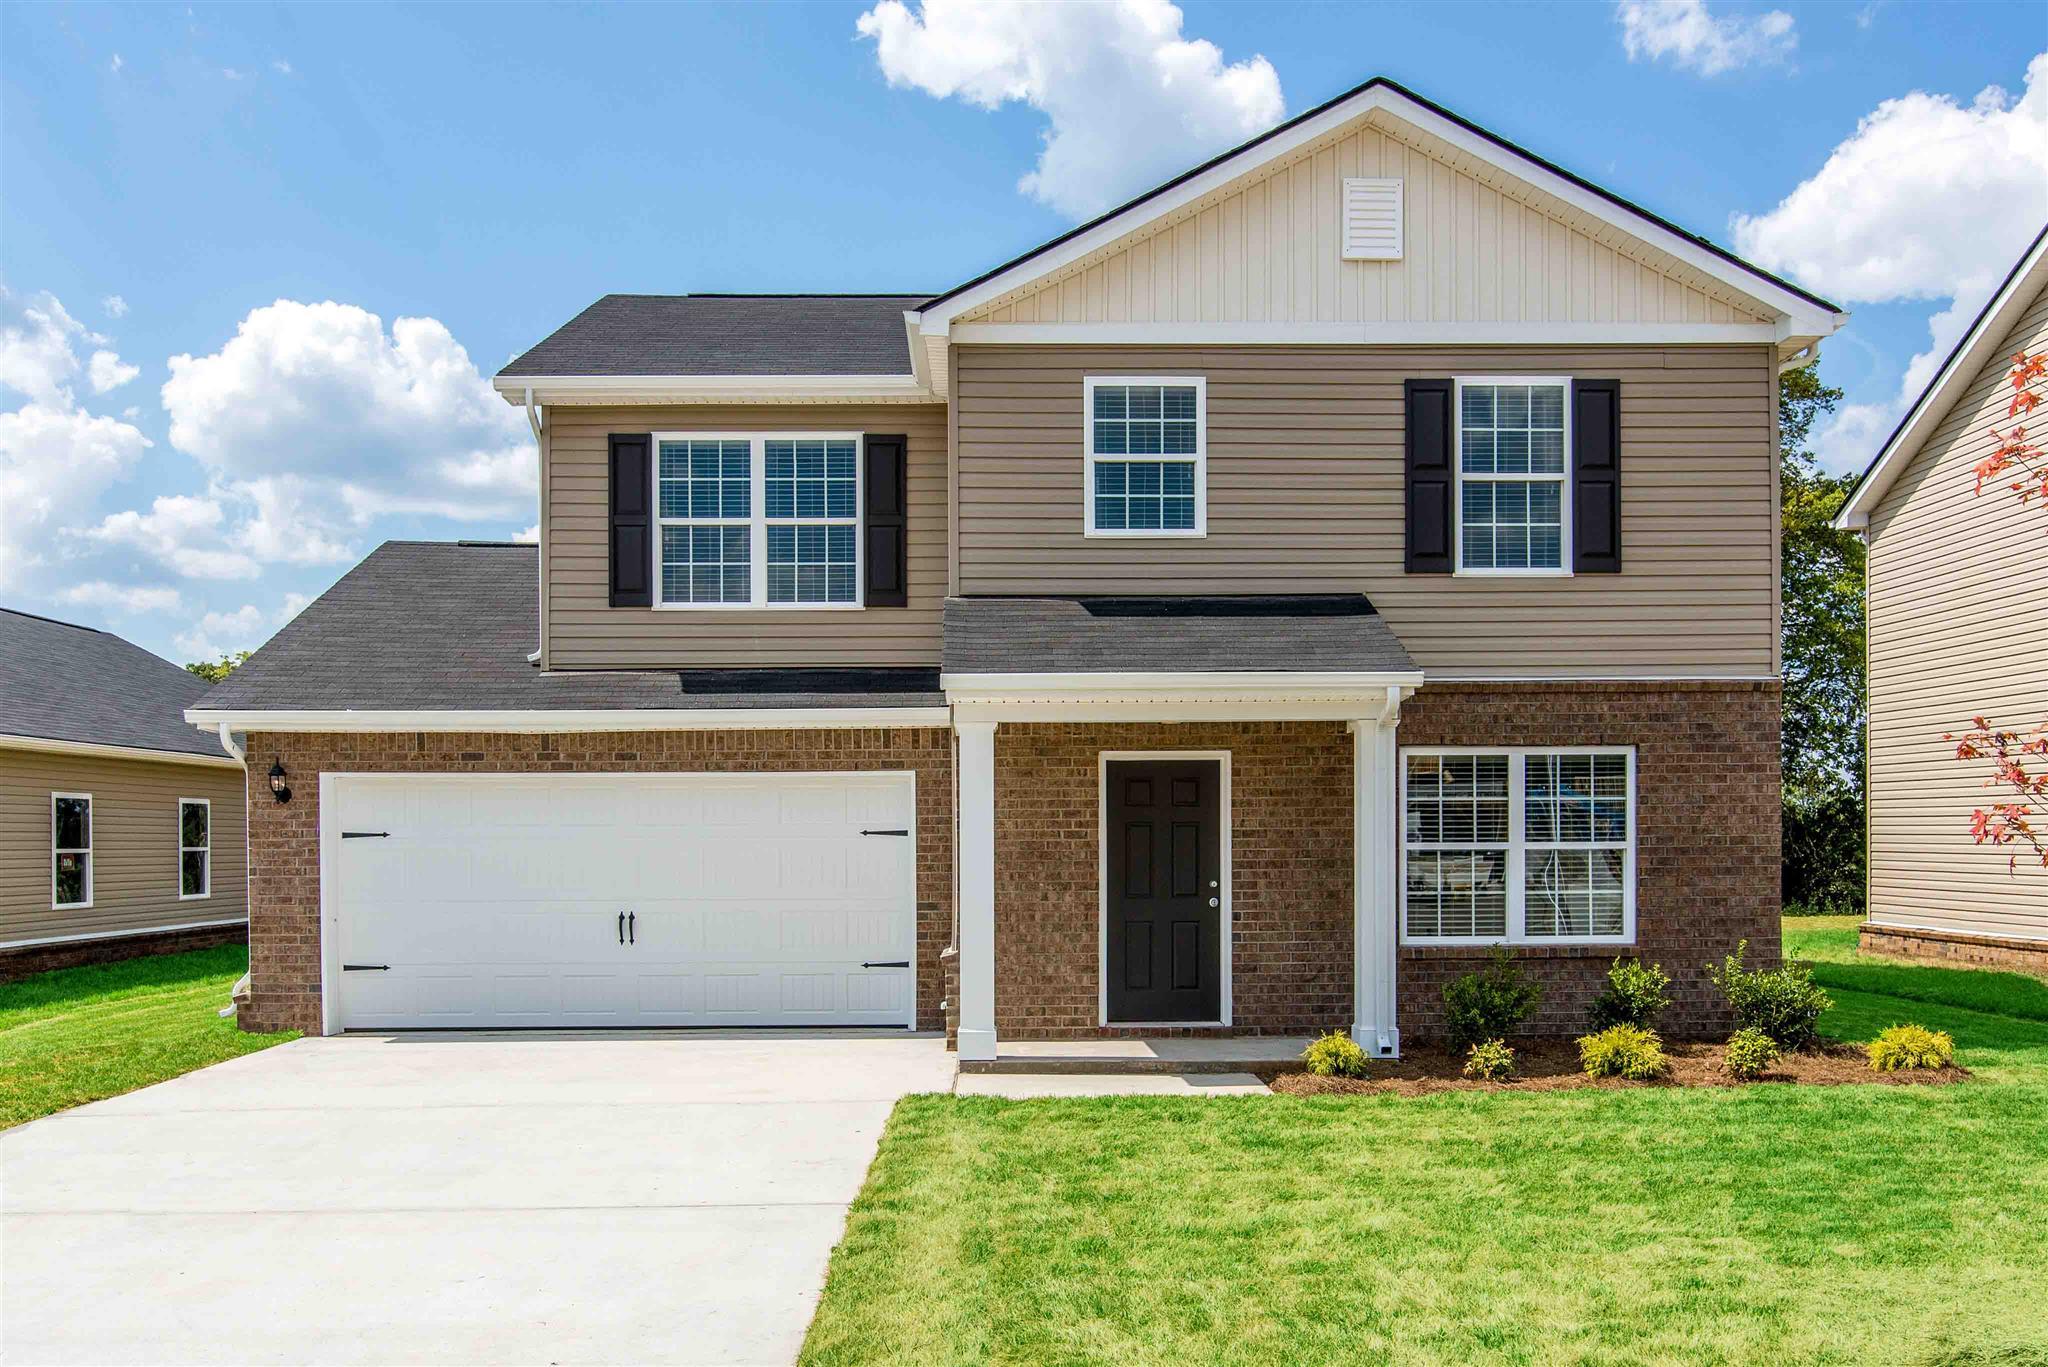 3604 Pitchers Lane, Murfreesboro, TN 37128